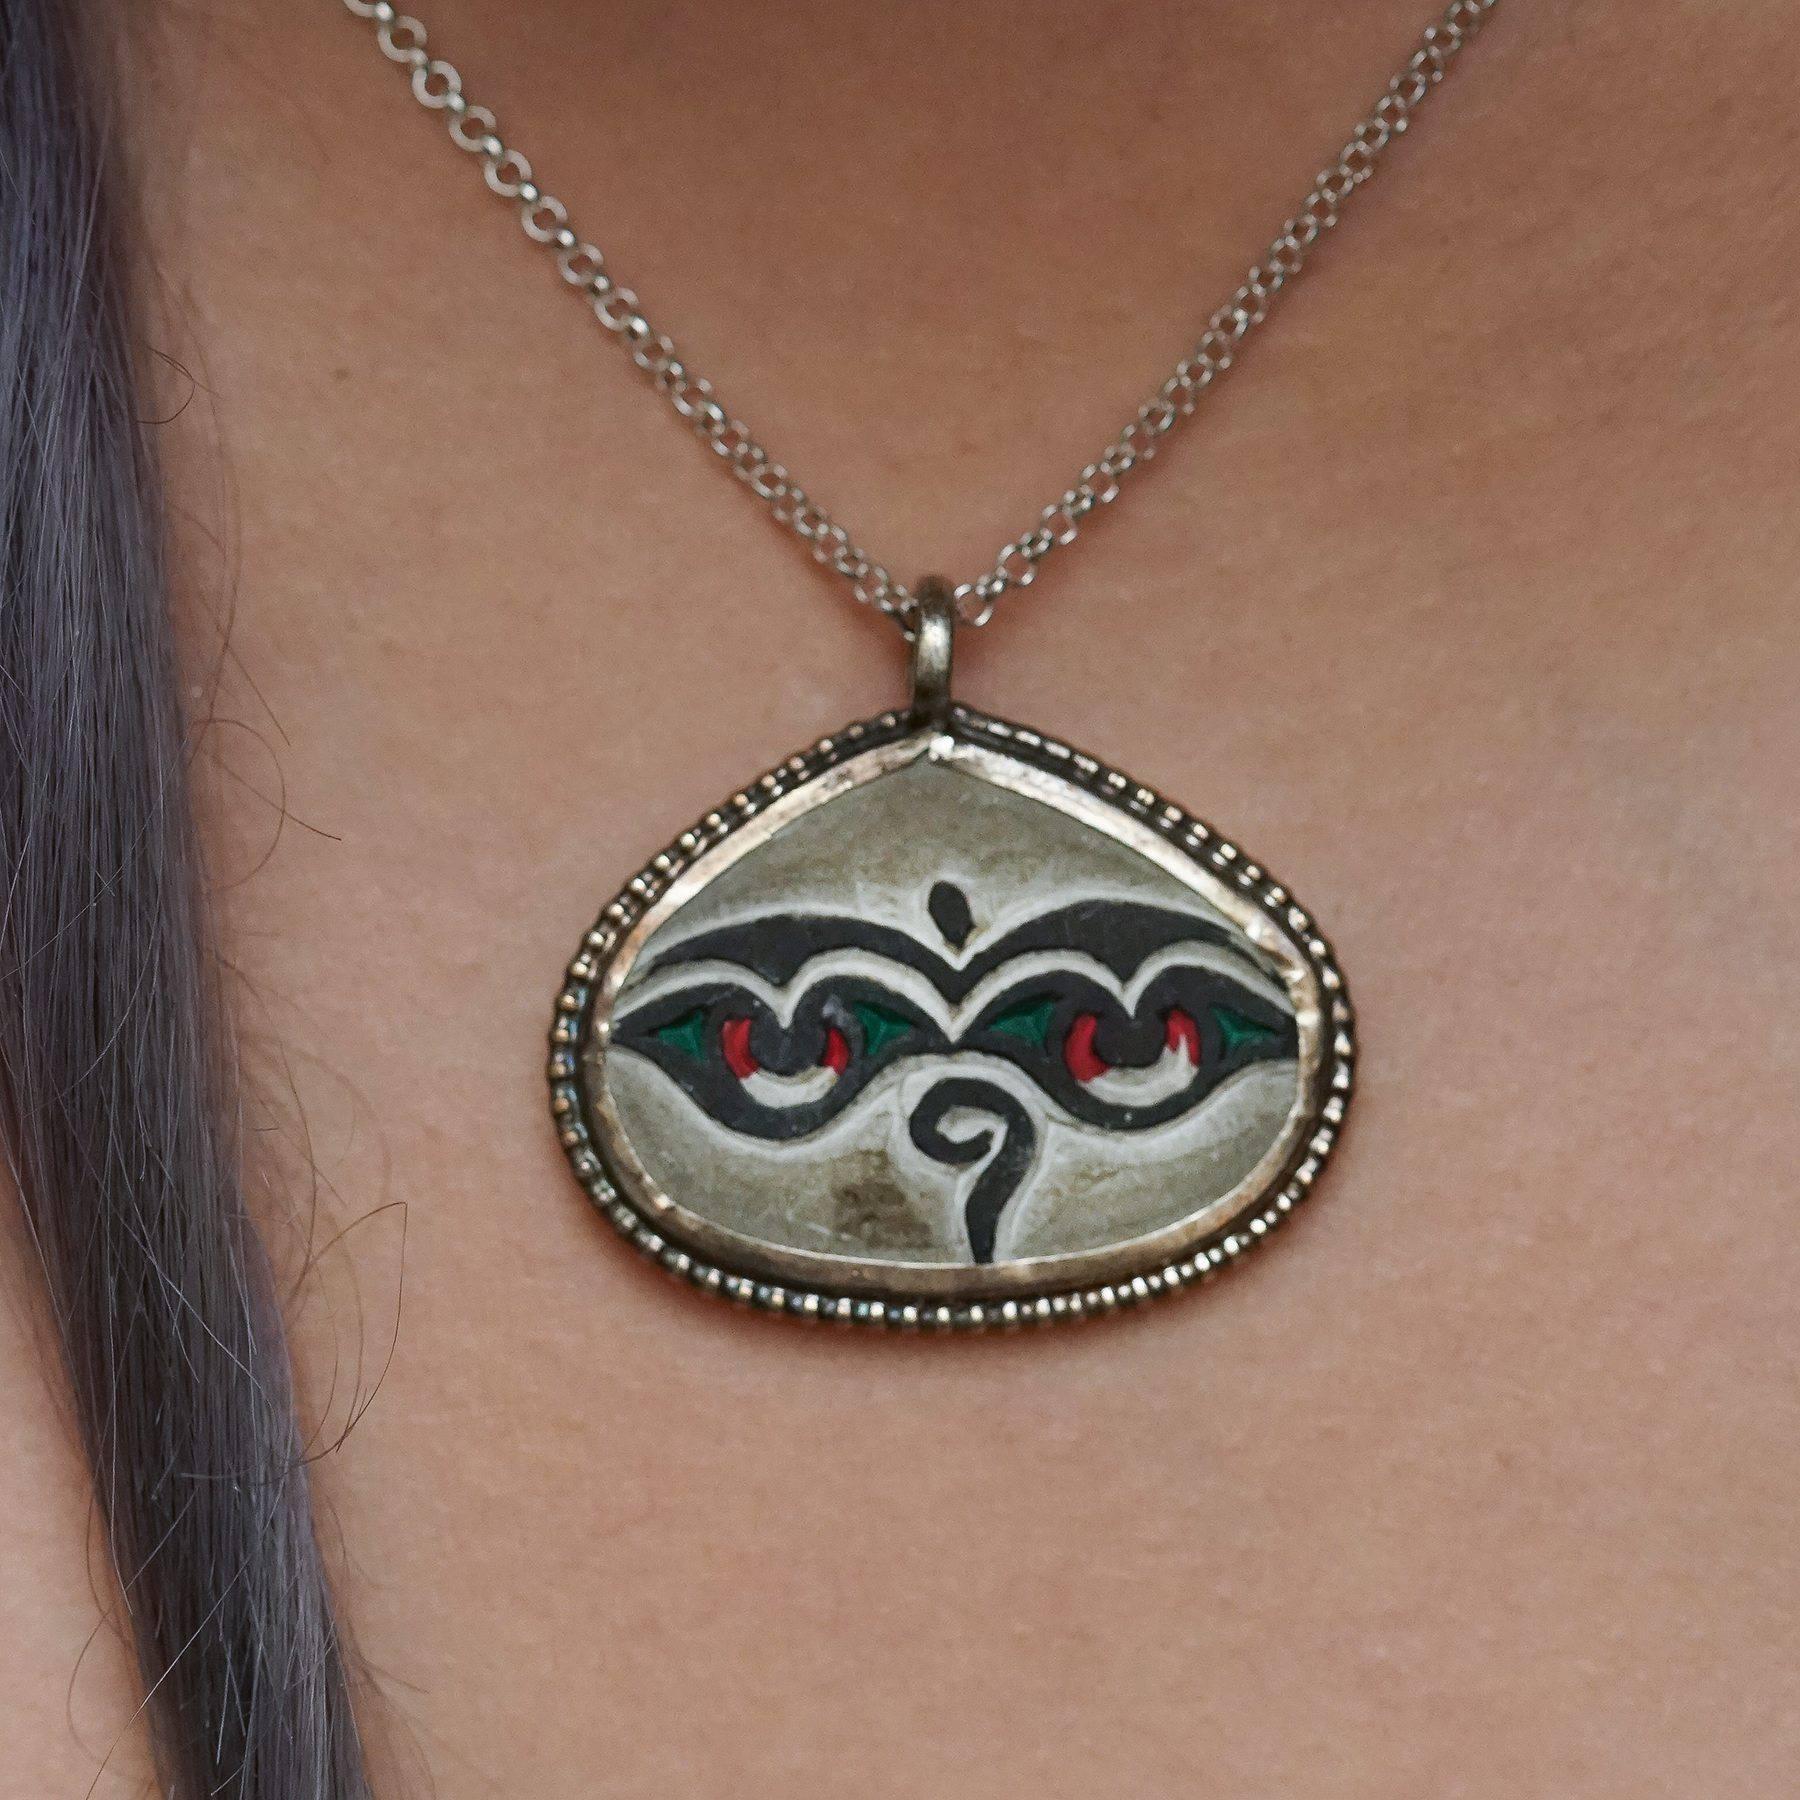 Mani stone pendants